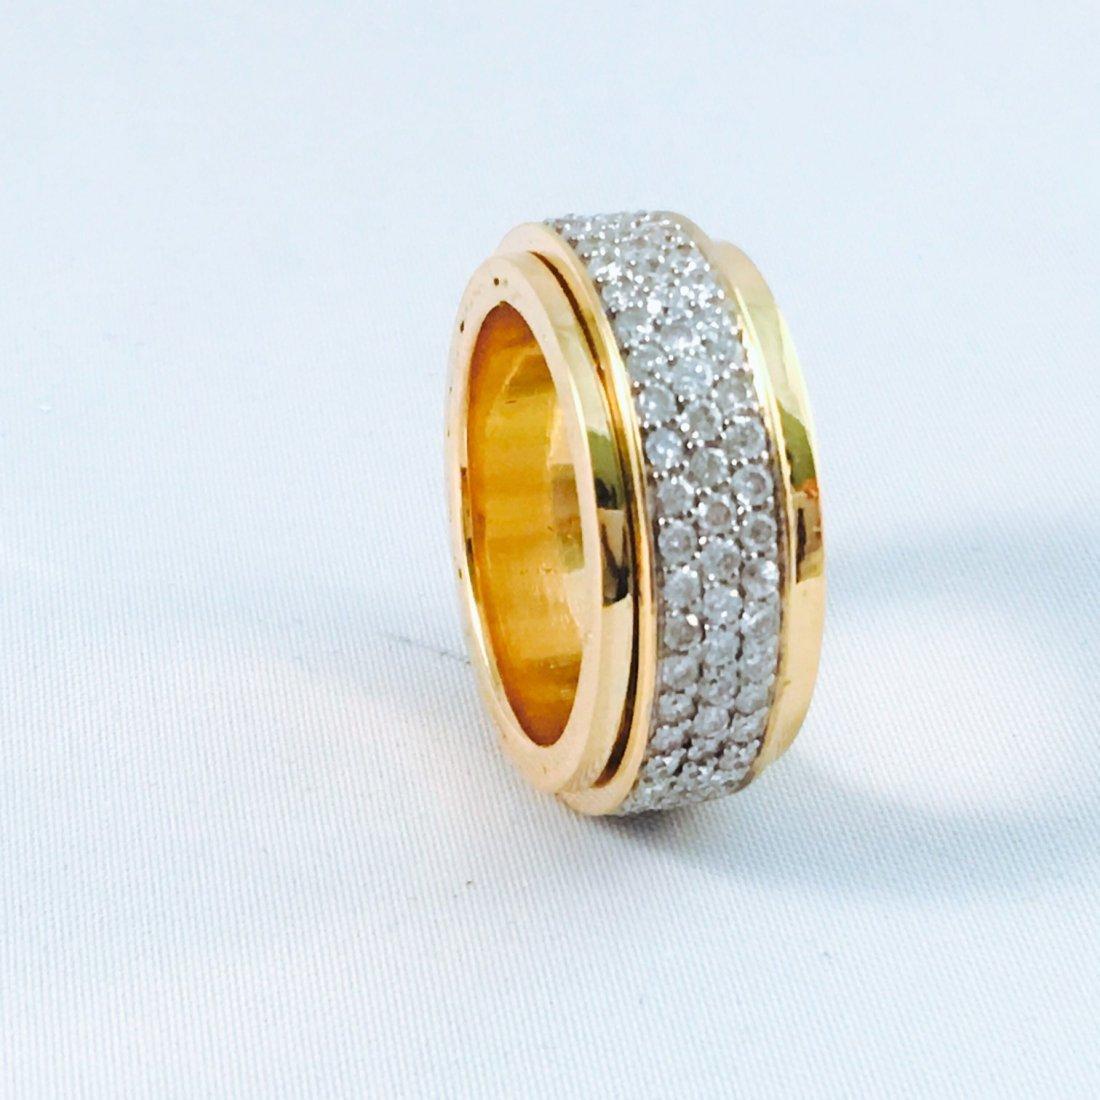 18K YELLOW GOLD, 4.00 CT DIAMOND RING.